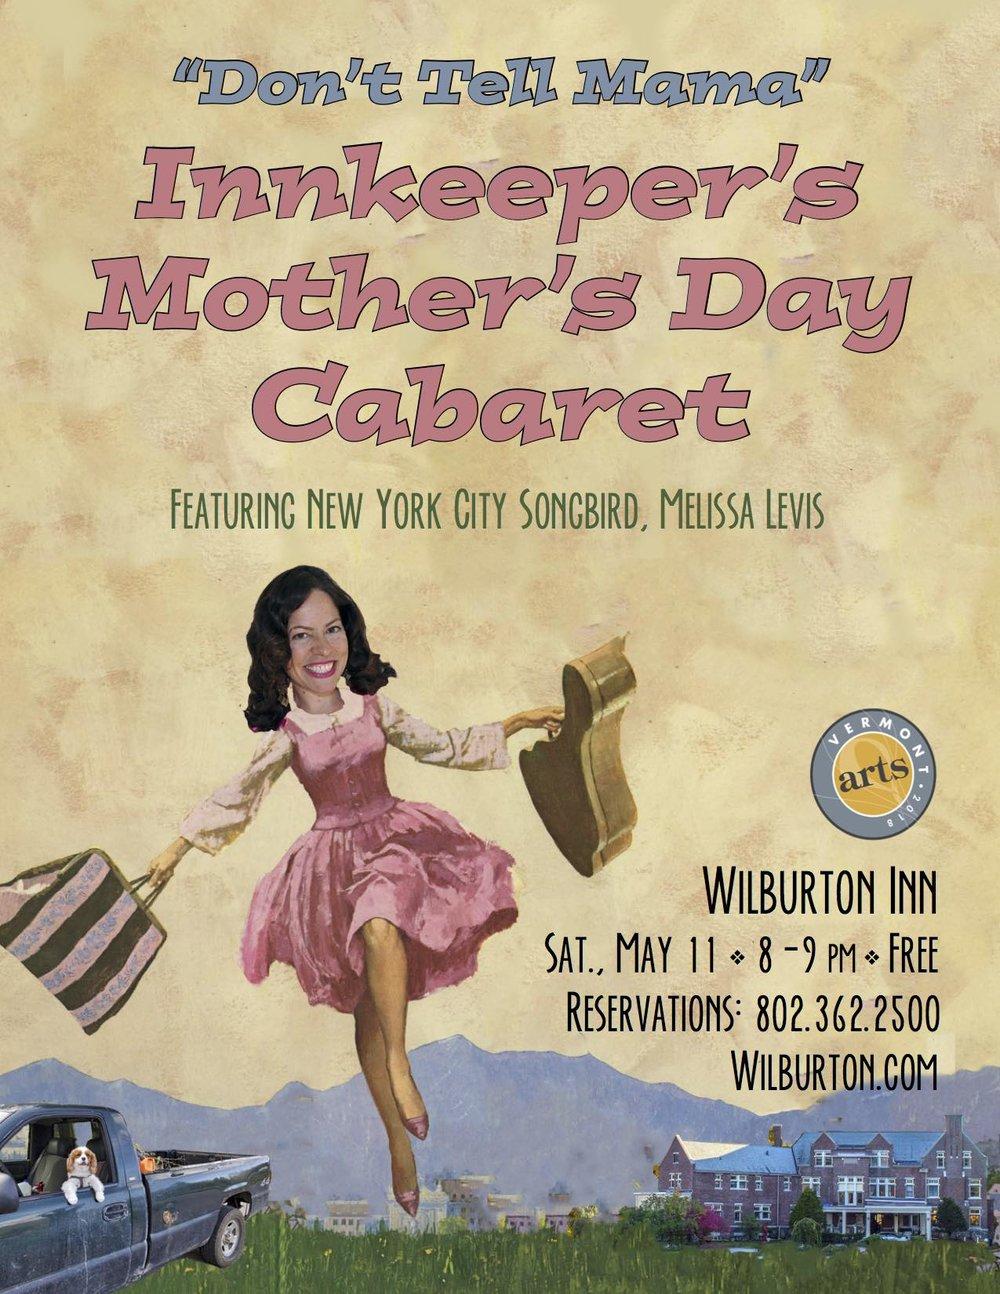 Mothers Day Cabaret 2019 (3).jpg